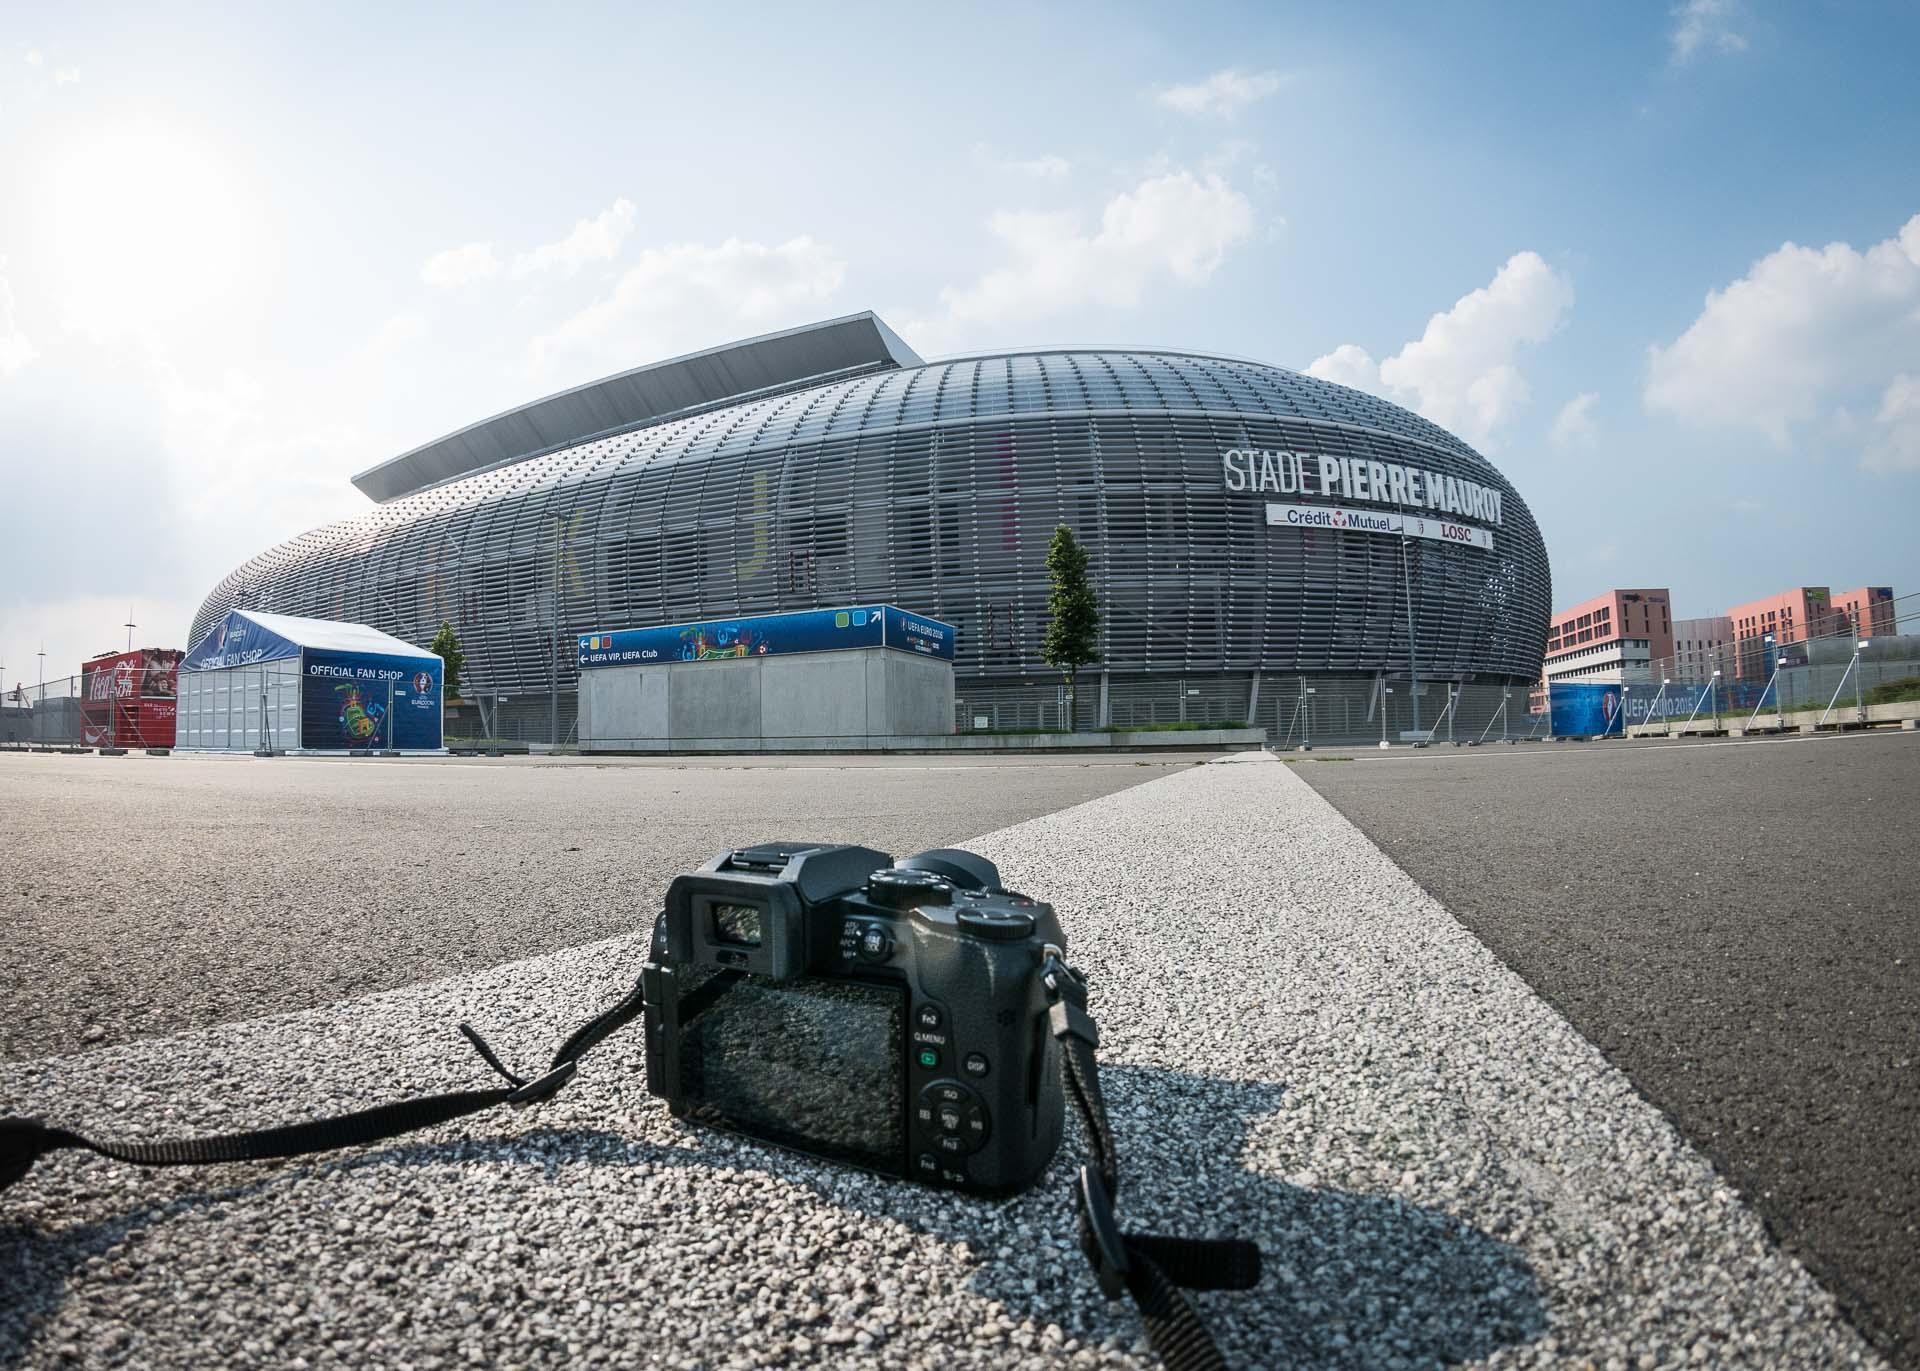 Lille Stade Pierre Mauroy Lumix G70-1